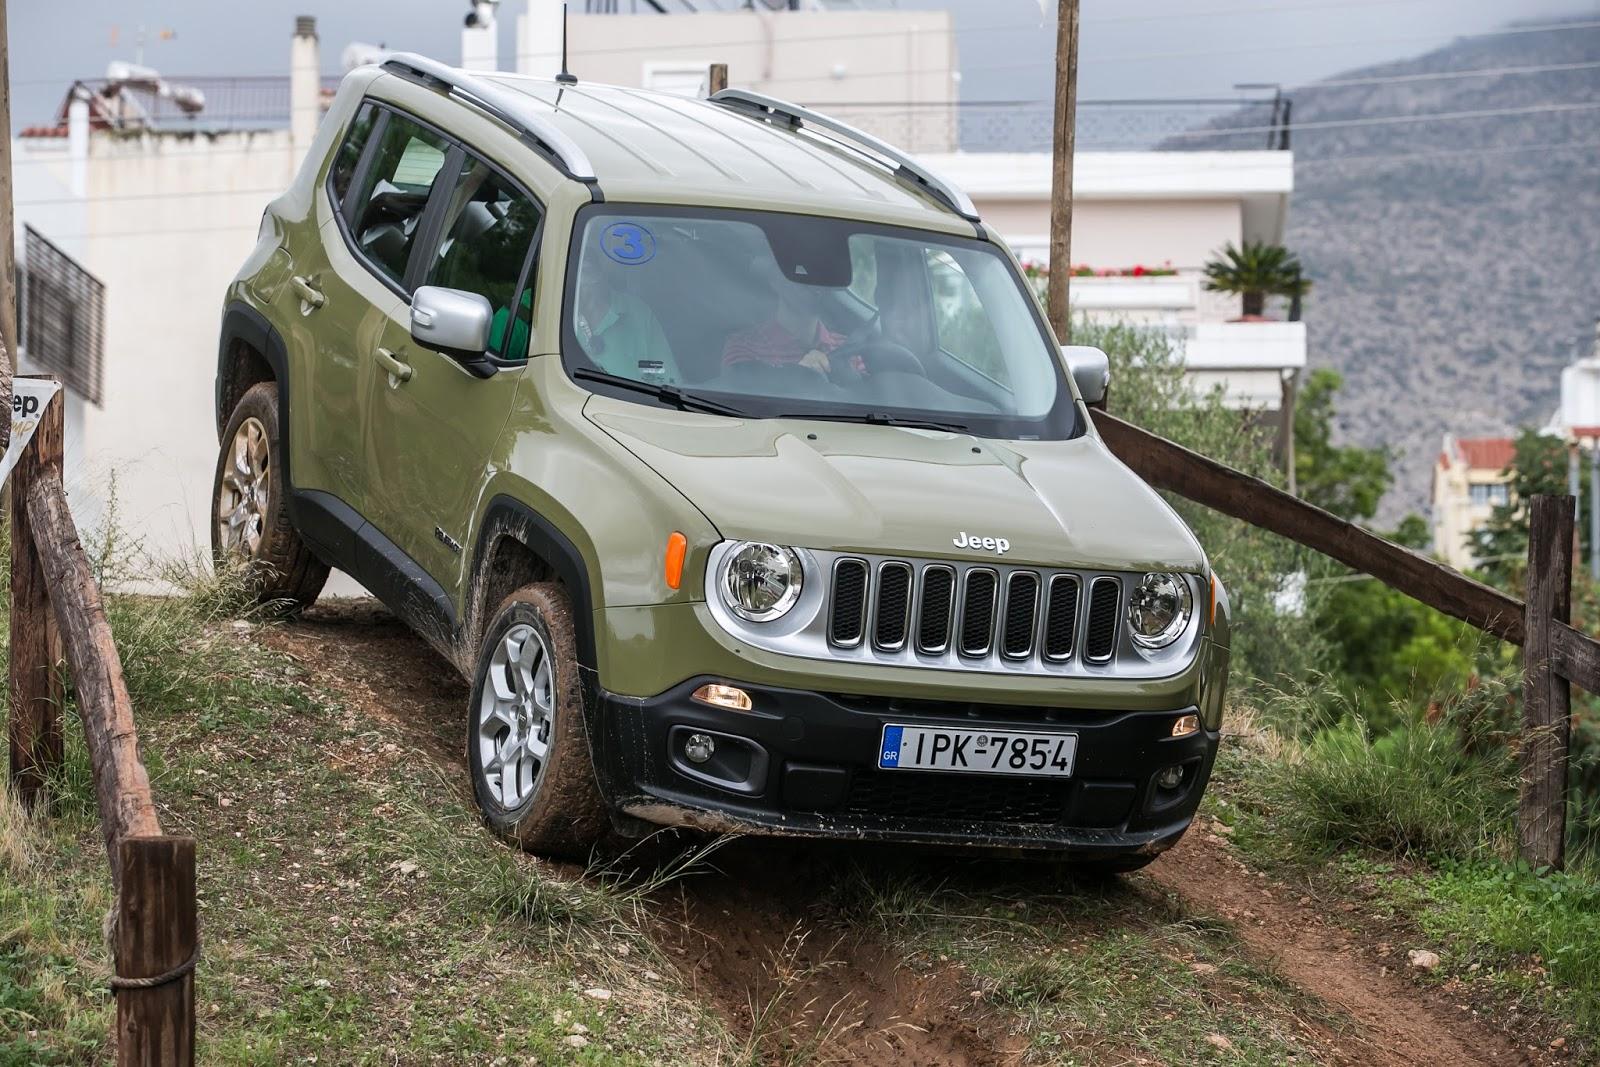 KF 1534 Πετάμε ένα Jeep Renegade σε λάσπες, πέτρες, άμμο, λίμνες. Θα τα καταφέρει; Jeep, Jeep Renegade, Renegade, SUV, TEST, zblog, ΔΟΚΙΜΕΣ